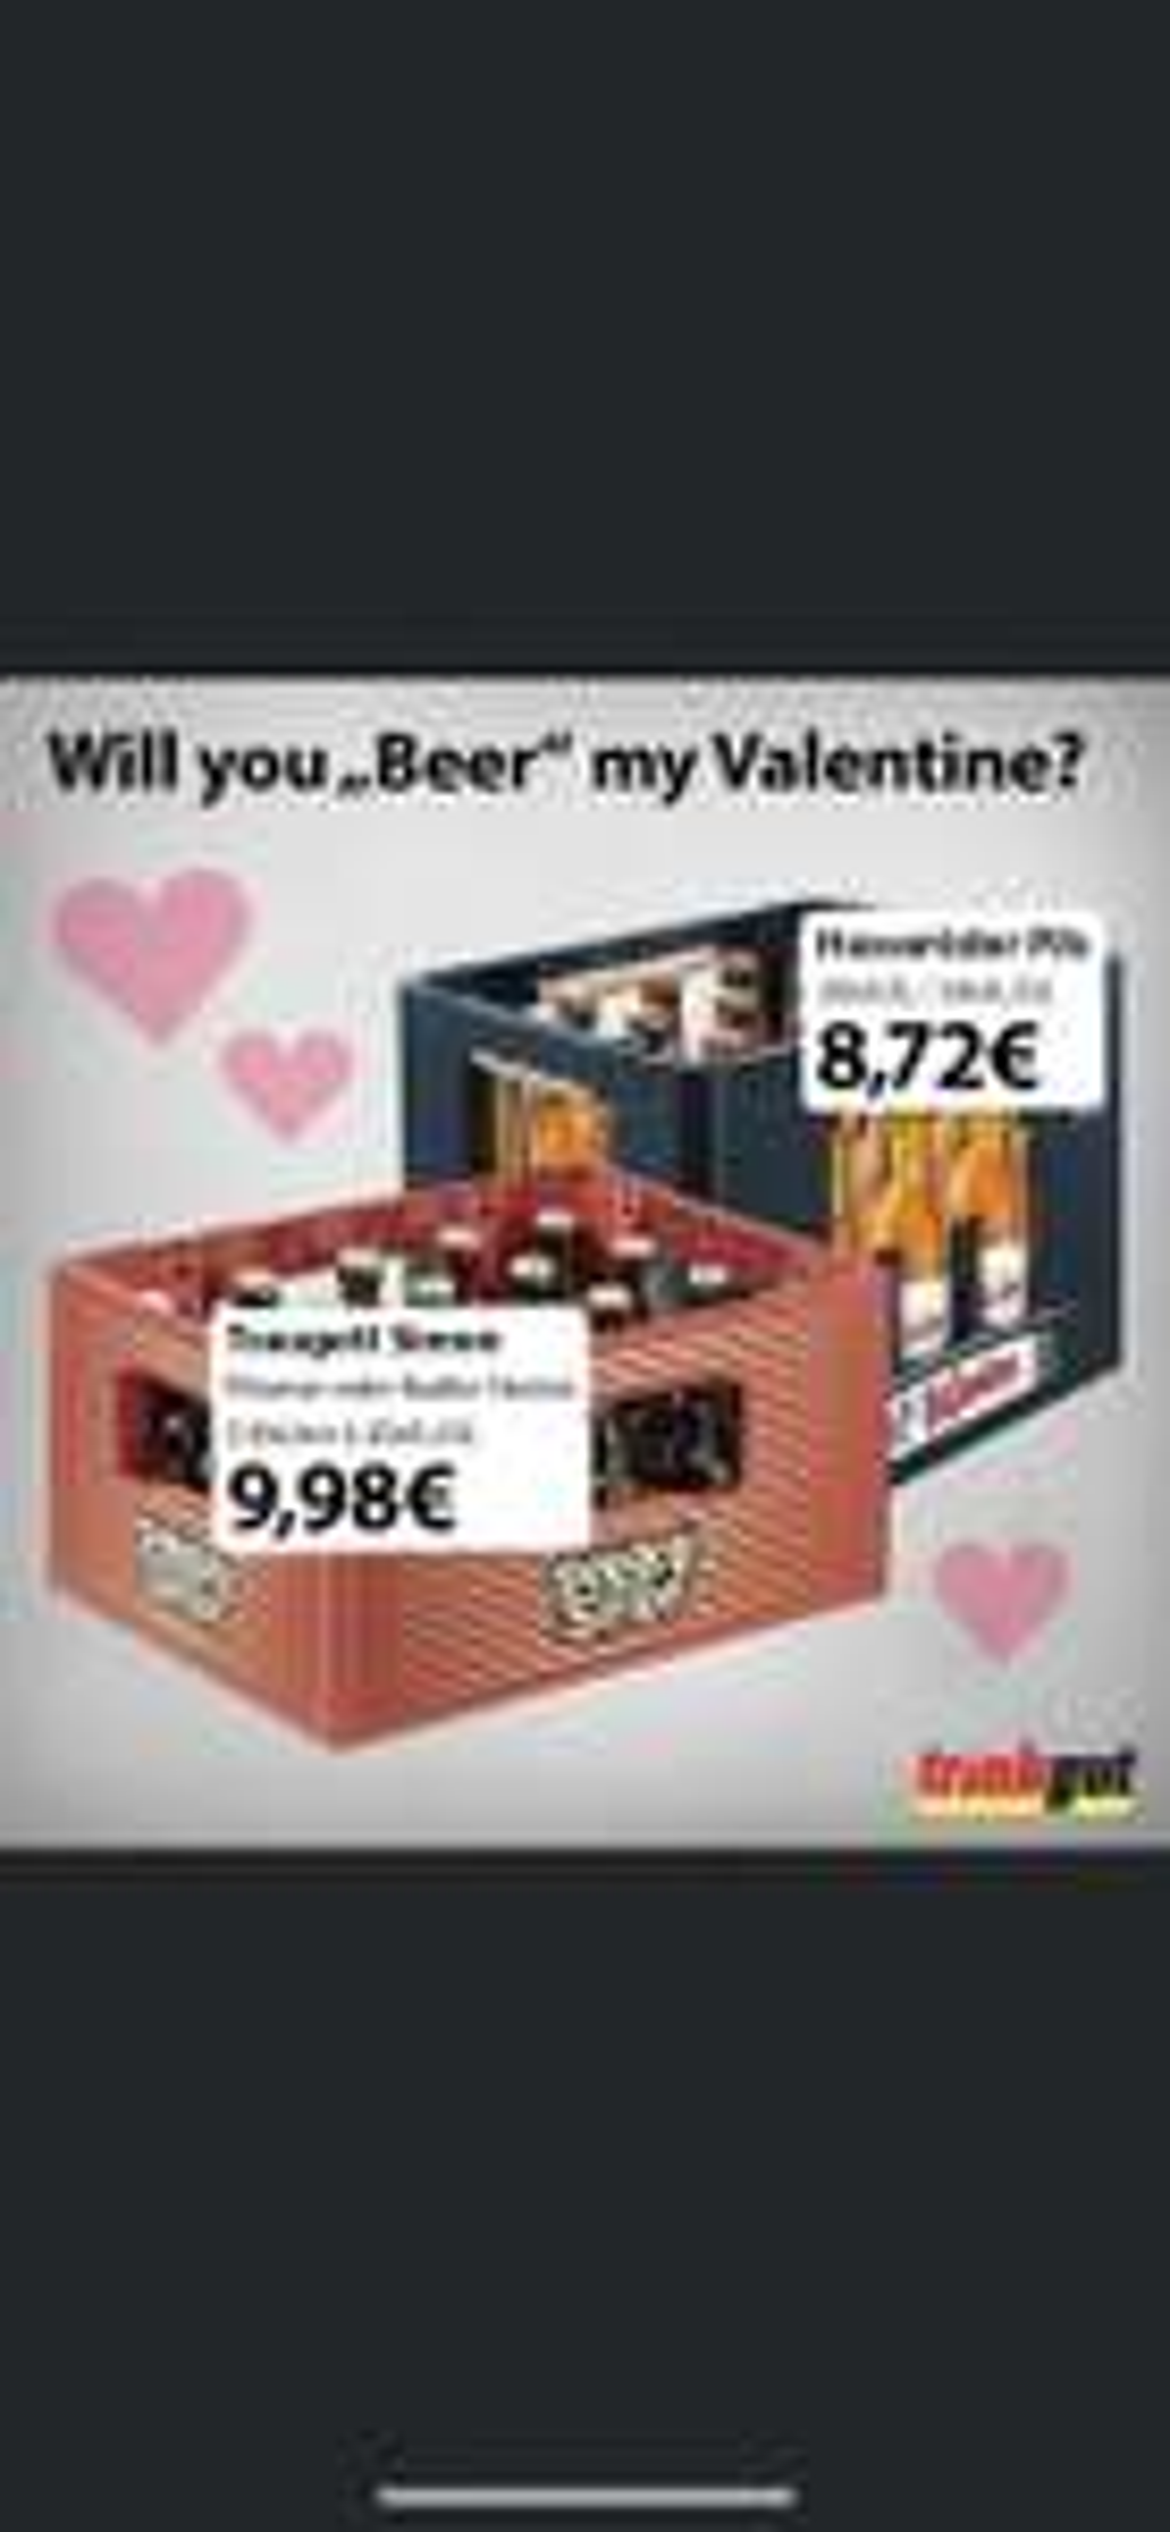 *Lokal Bier*Hasseröder Pils 0,87€/L Traugott Simon 0,76€/L